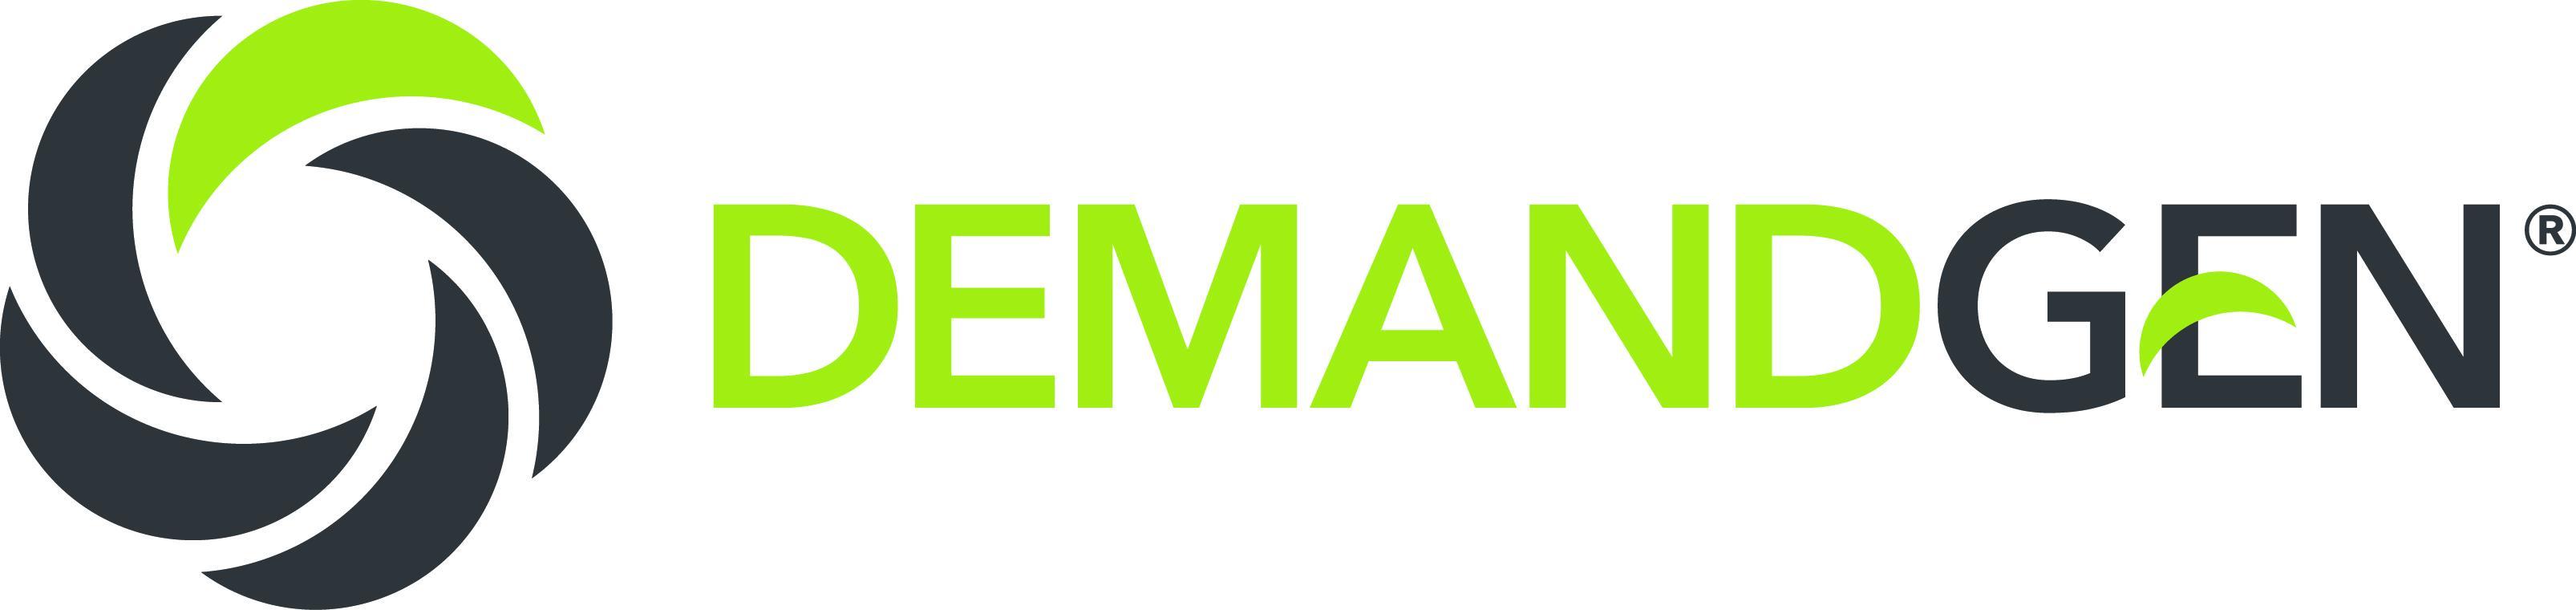 DemandGen International, Inc.